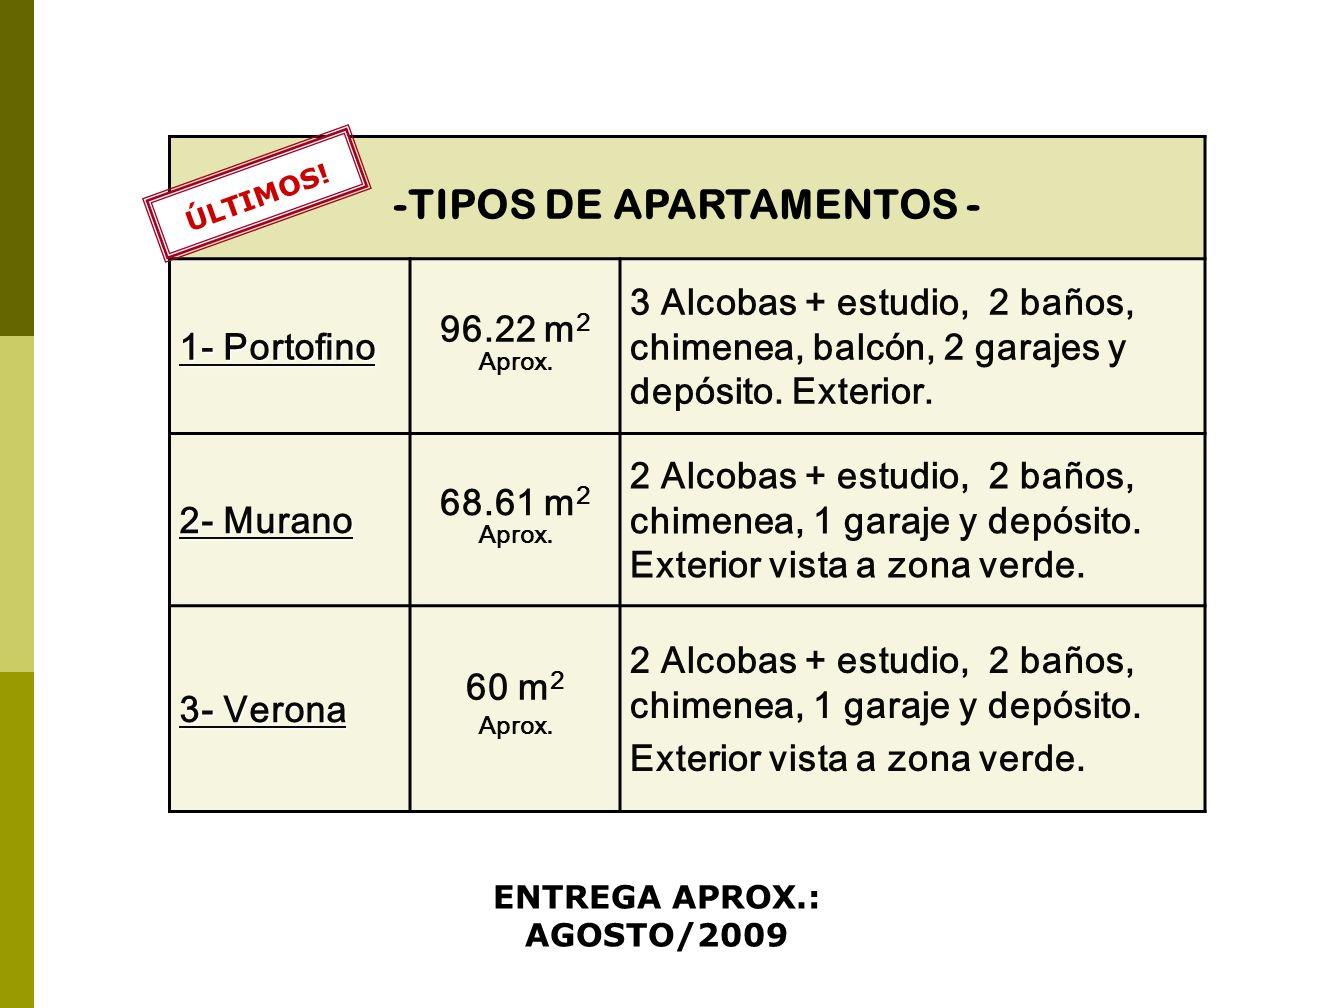 -TIPOS DE APARTAMENTOS - ENTREGA APROX.: AGOSTO/2009